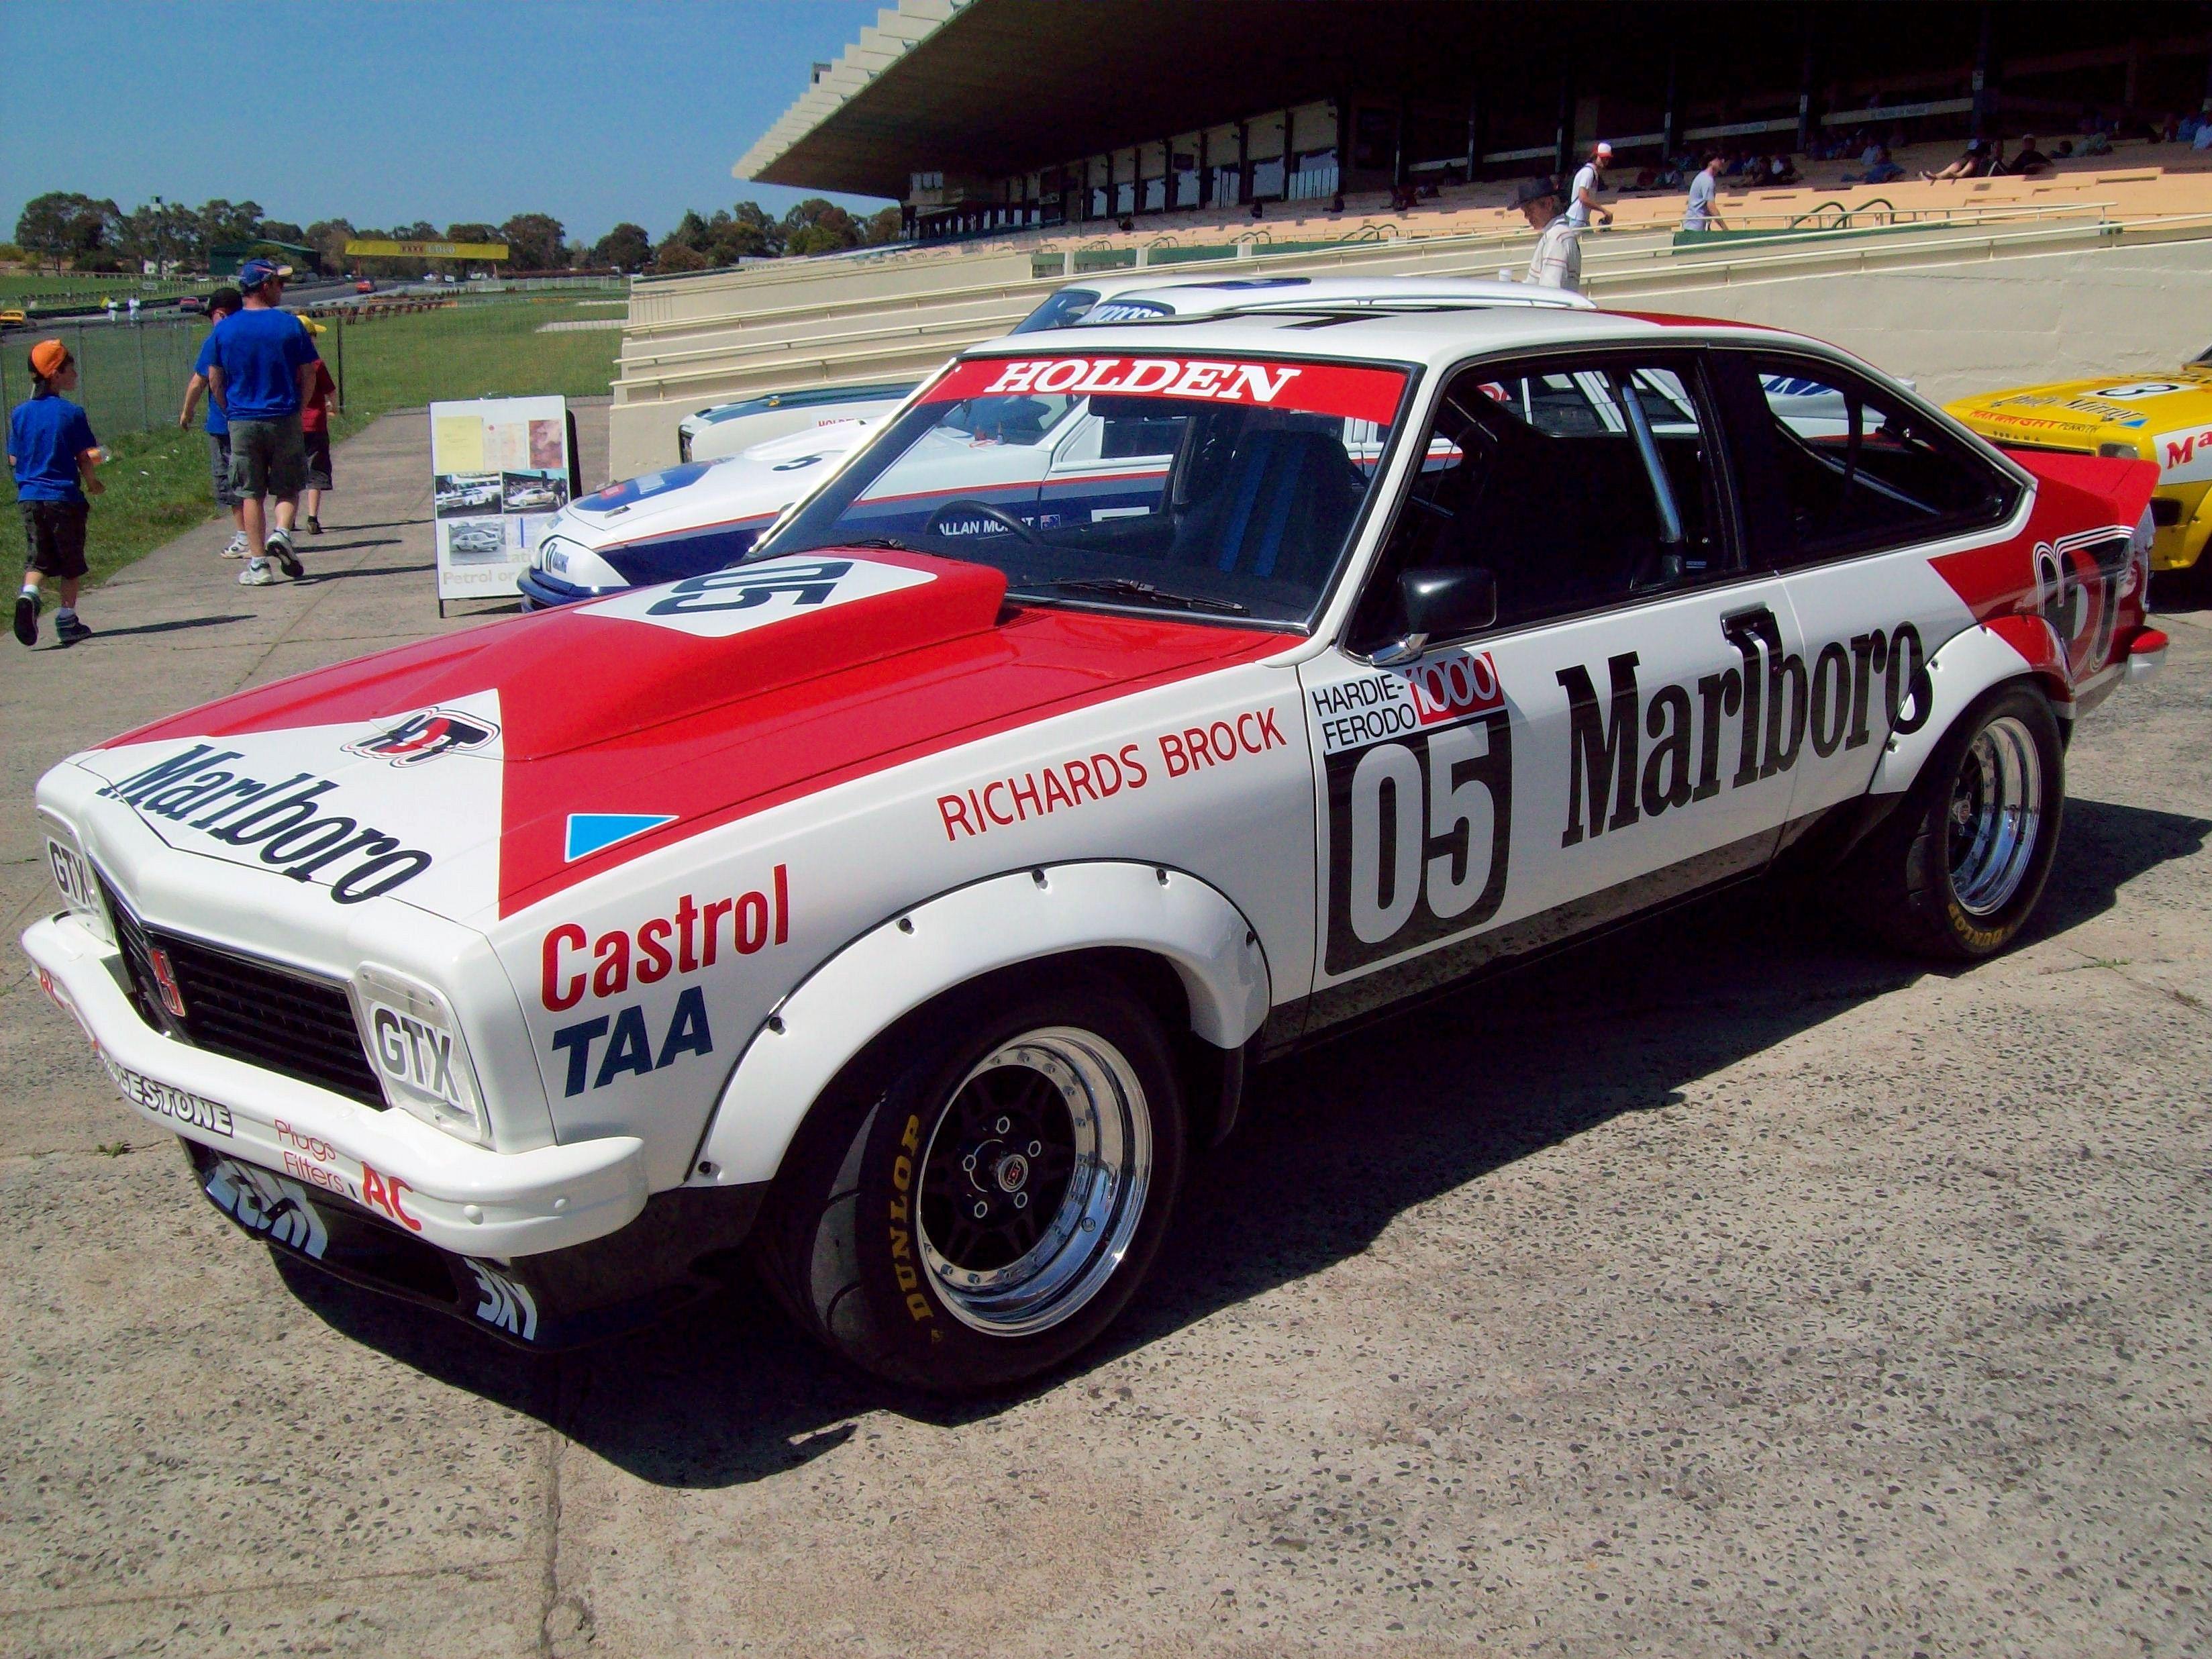 Lx Torana Race Car For Sale